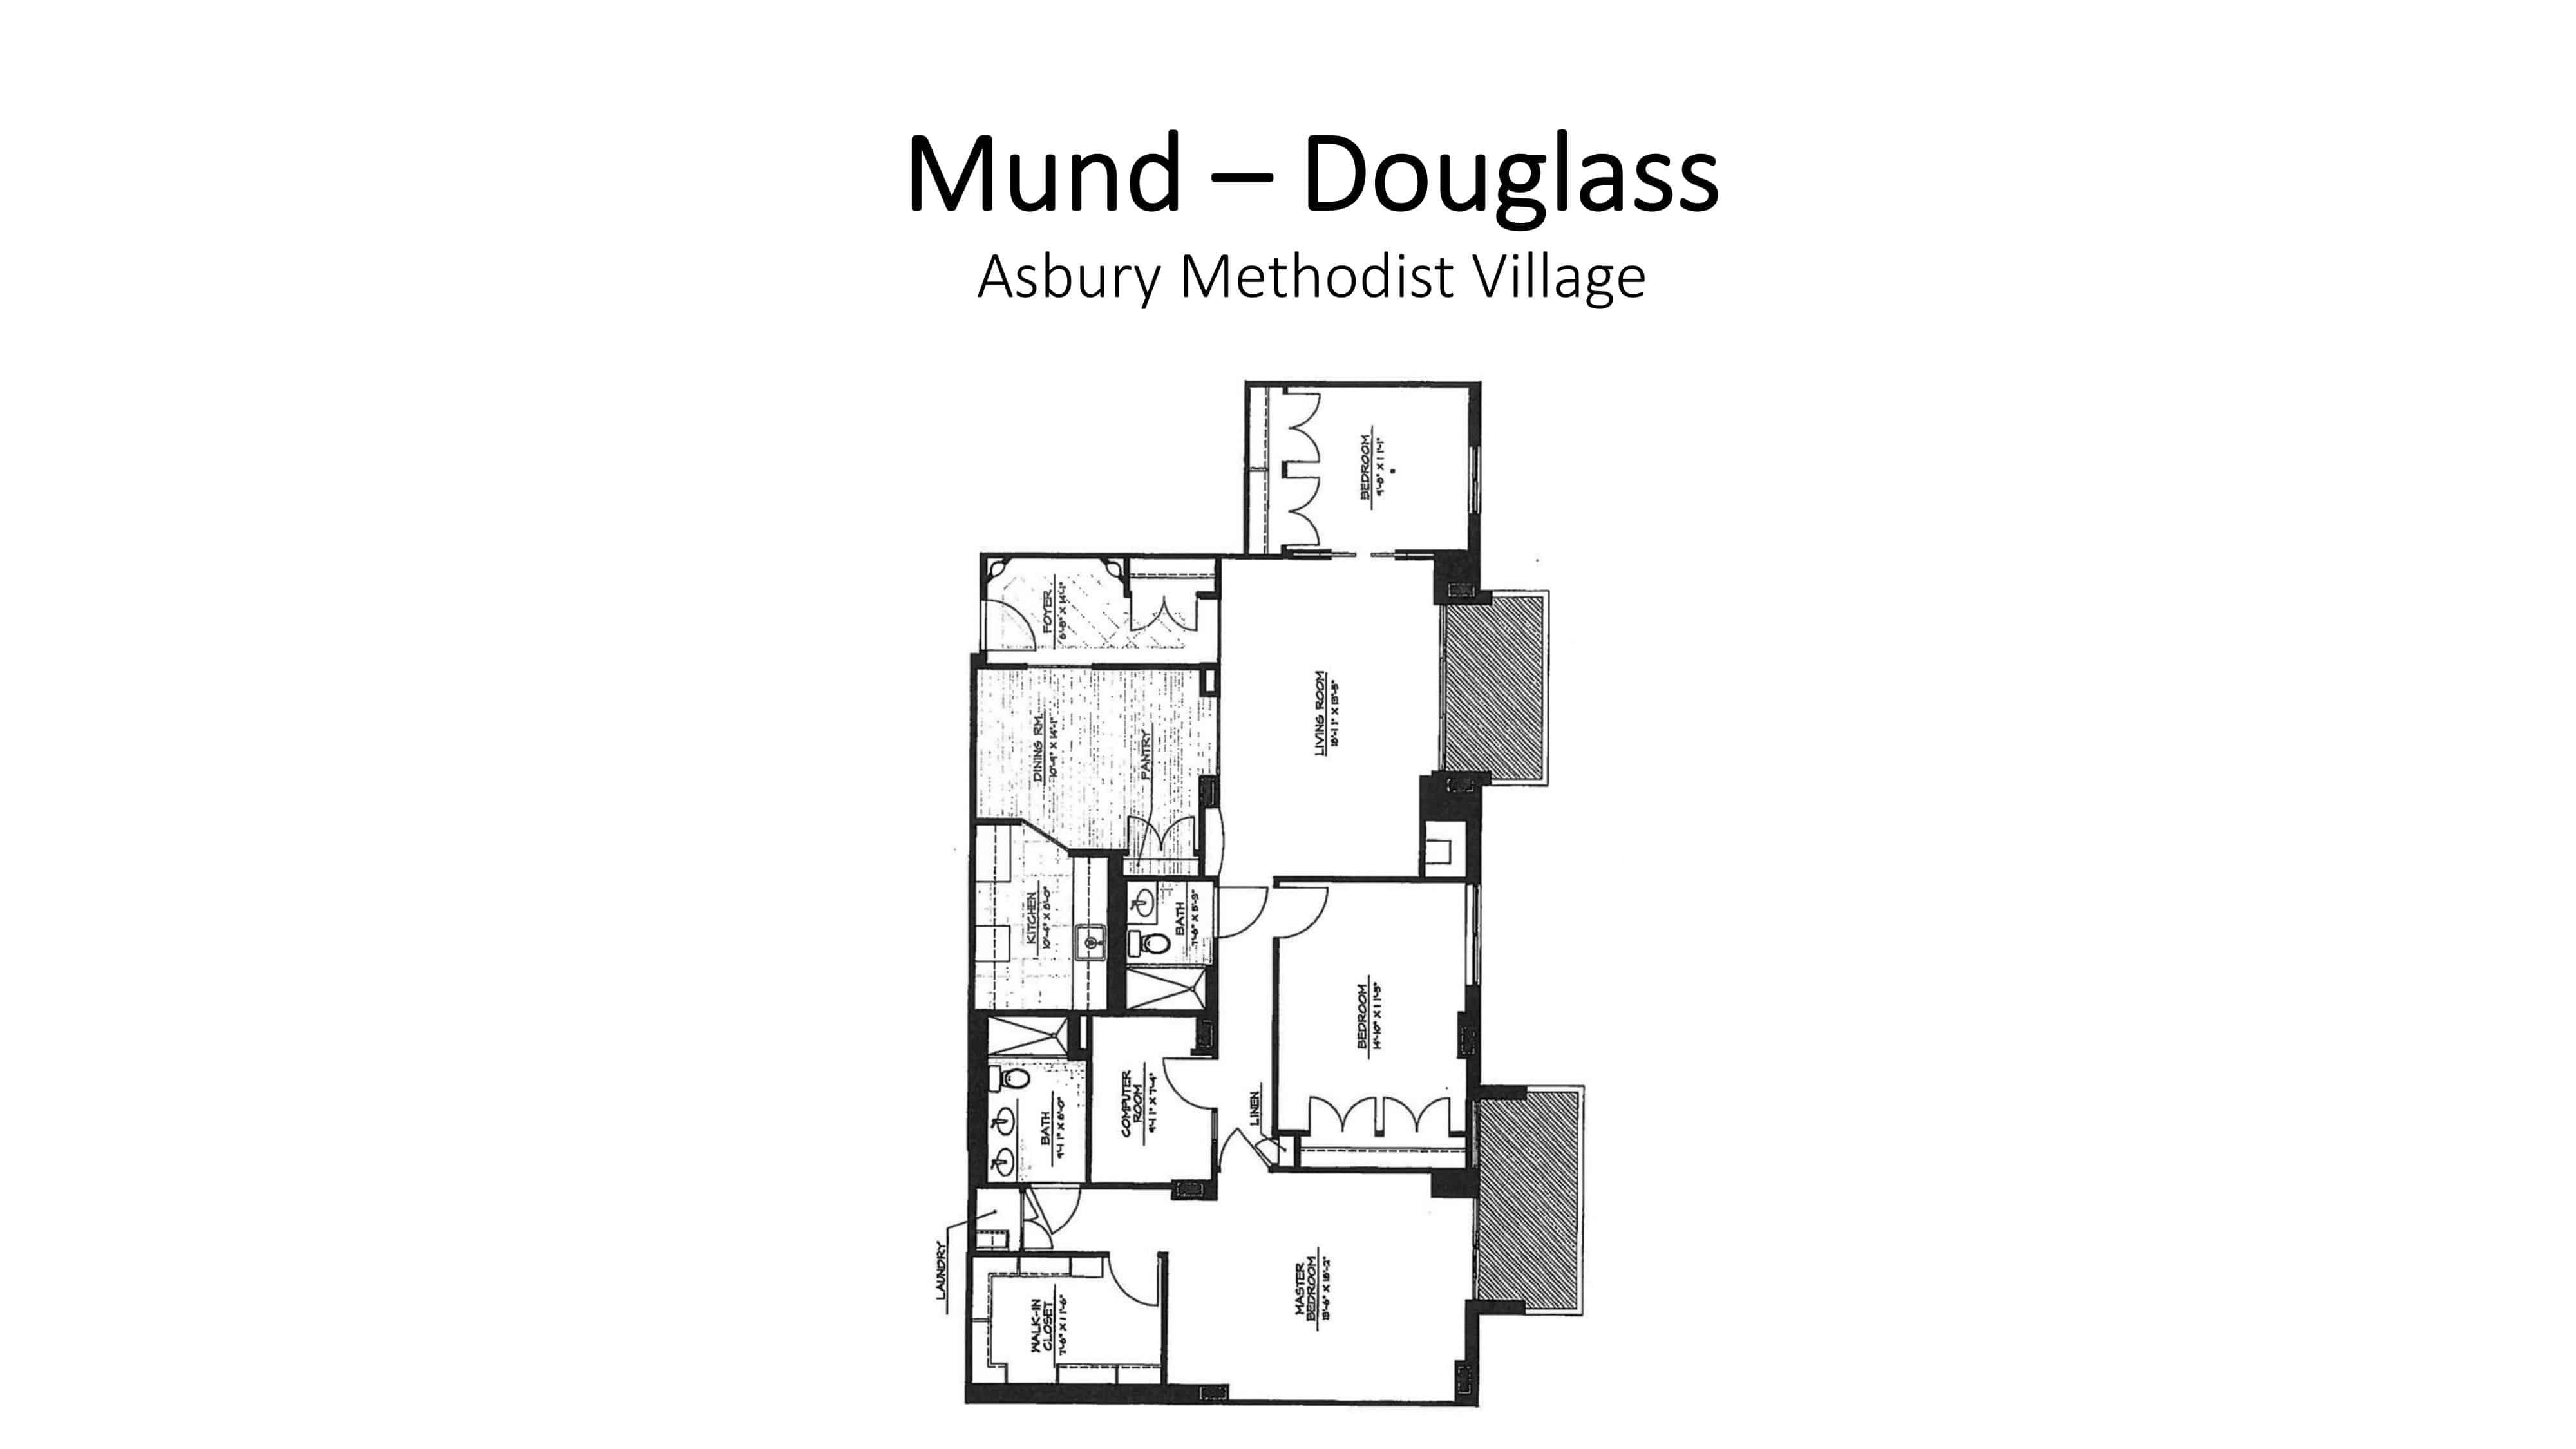 AMV Mund - Douglass